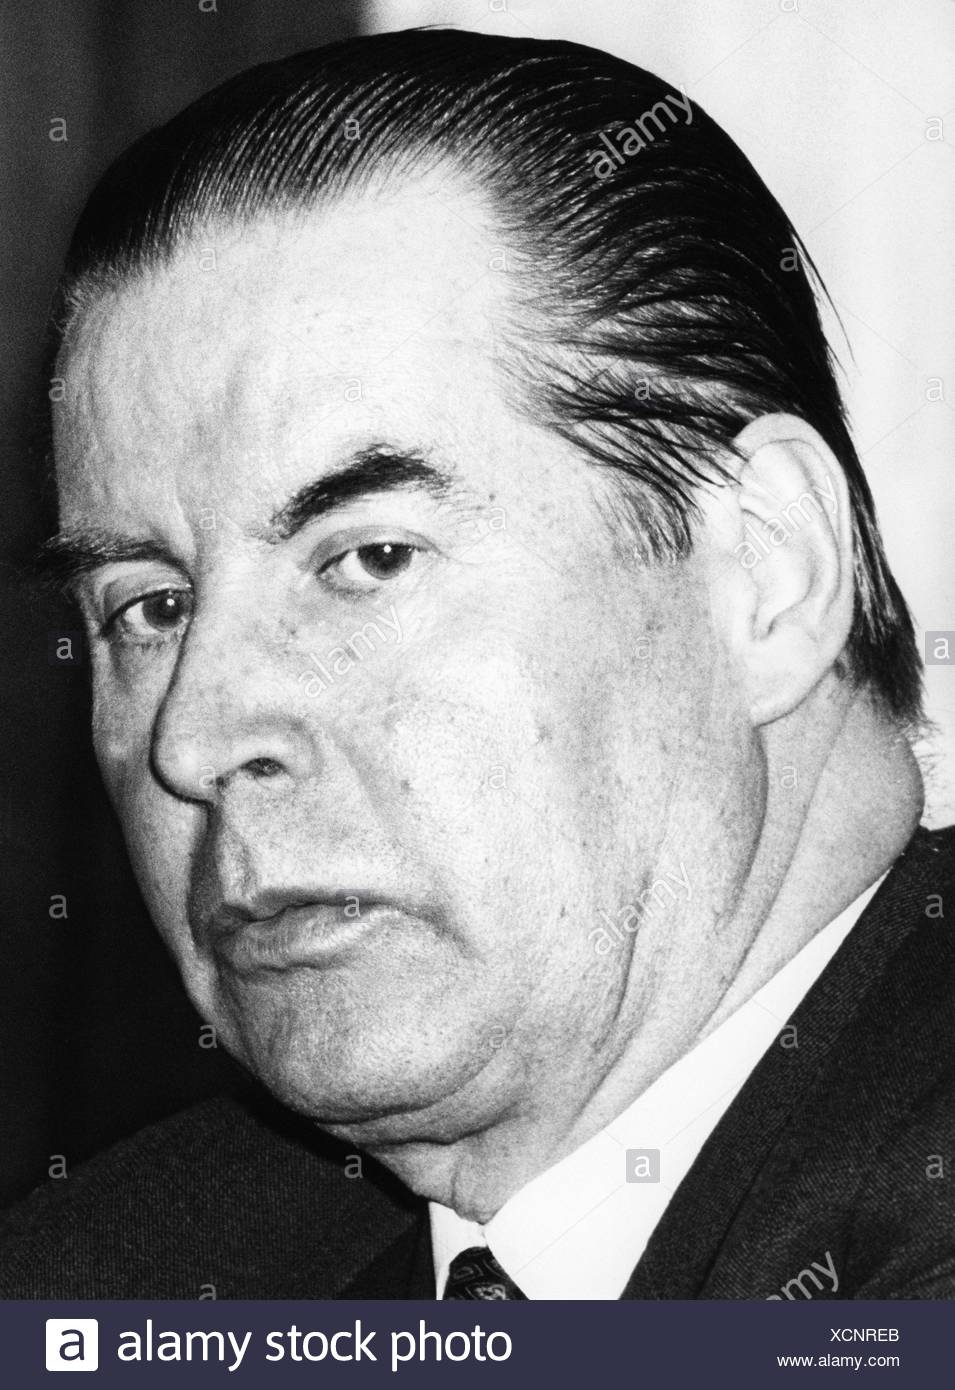 Schroeder, Gerhard, 11.10.1910 - 31.12.1989, German politician (CDU), Chairman of the Board of Foreign Affairs 1969 - 1980, port Stockbild